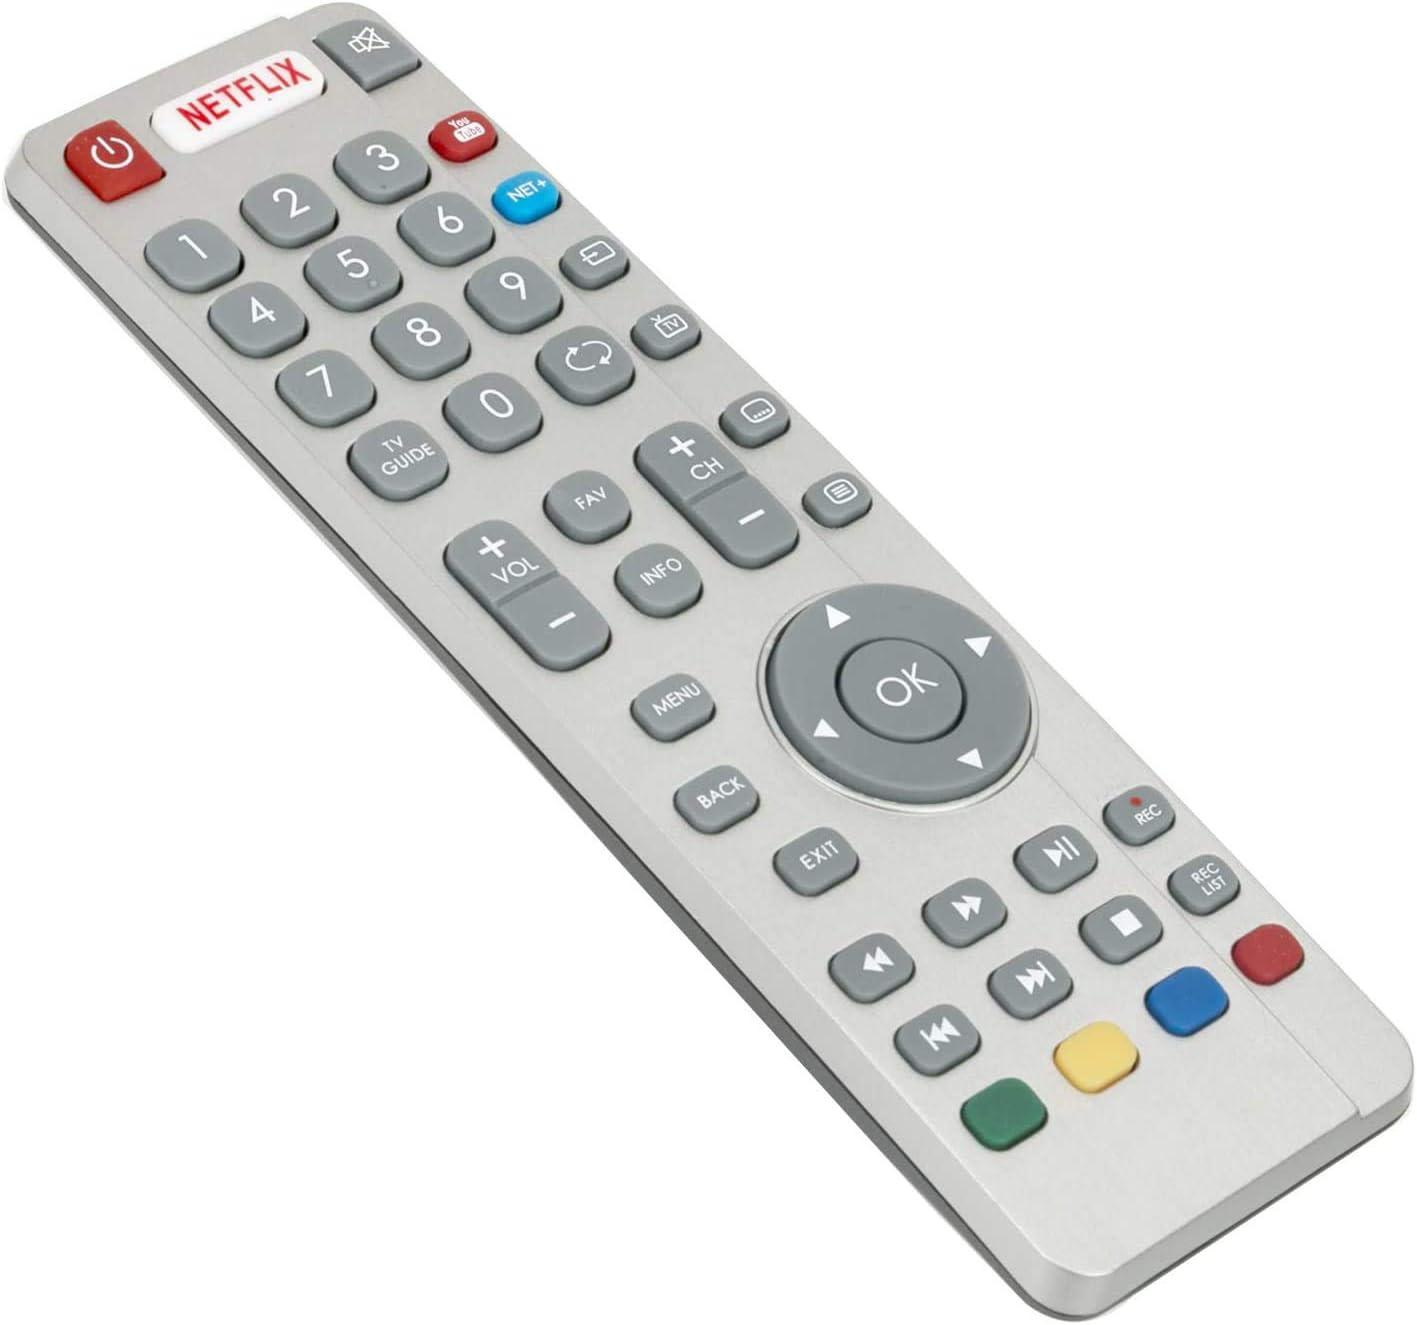 ALLIMITY SHW/RMC/0116 RF Control remoto reemplazado para Sharp Aquos 3D HD LCD LED Smart TV con Netflix Youtube NET+Botones: Amazon.es: Electrónica